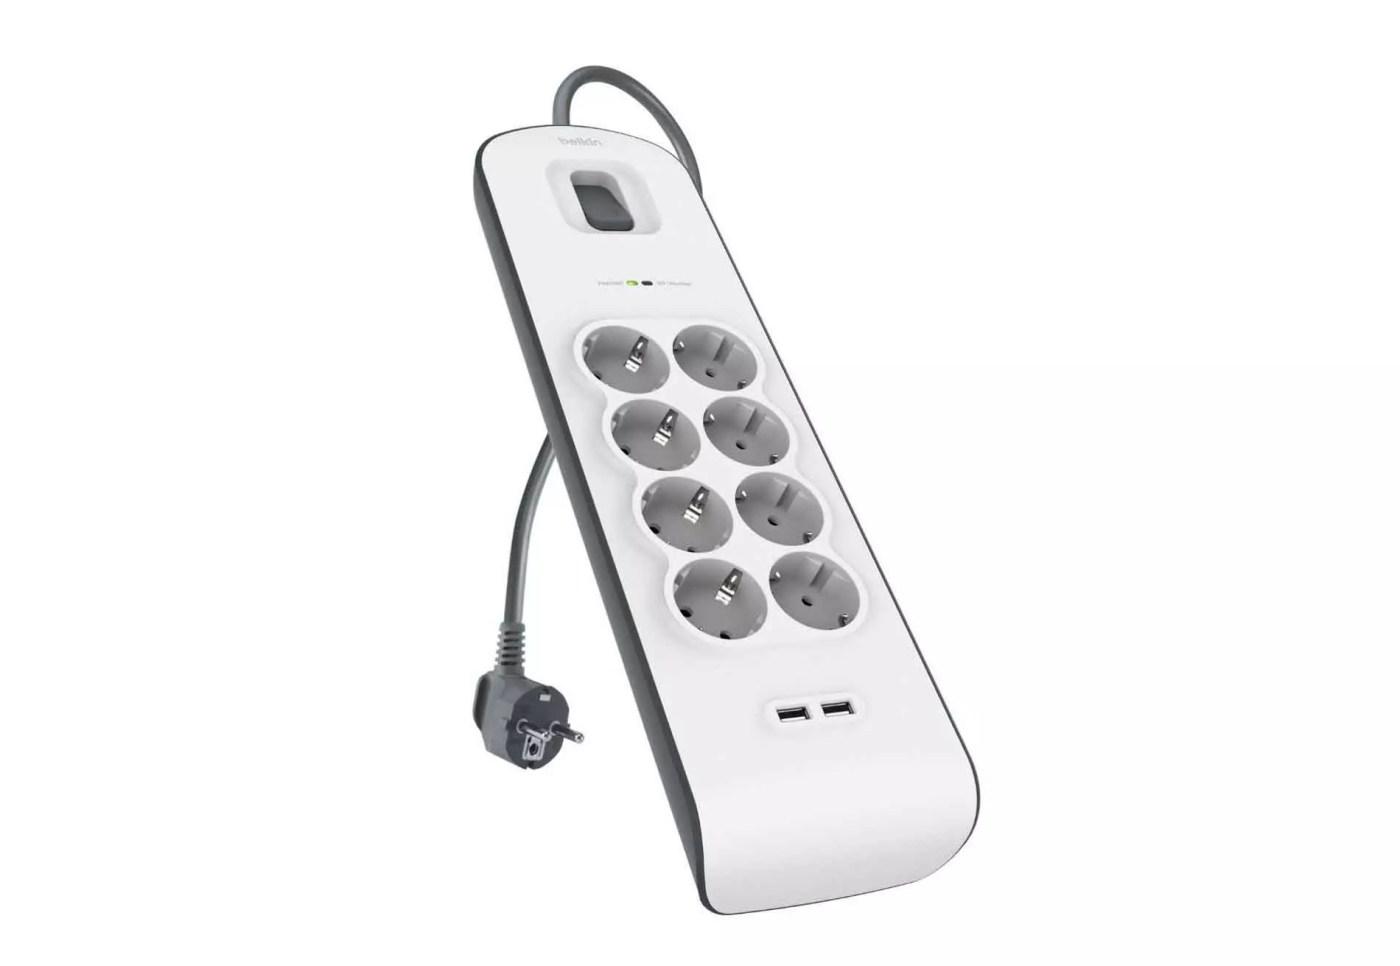 Regleta con protección - - Accesorios para Smart TV